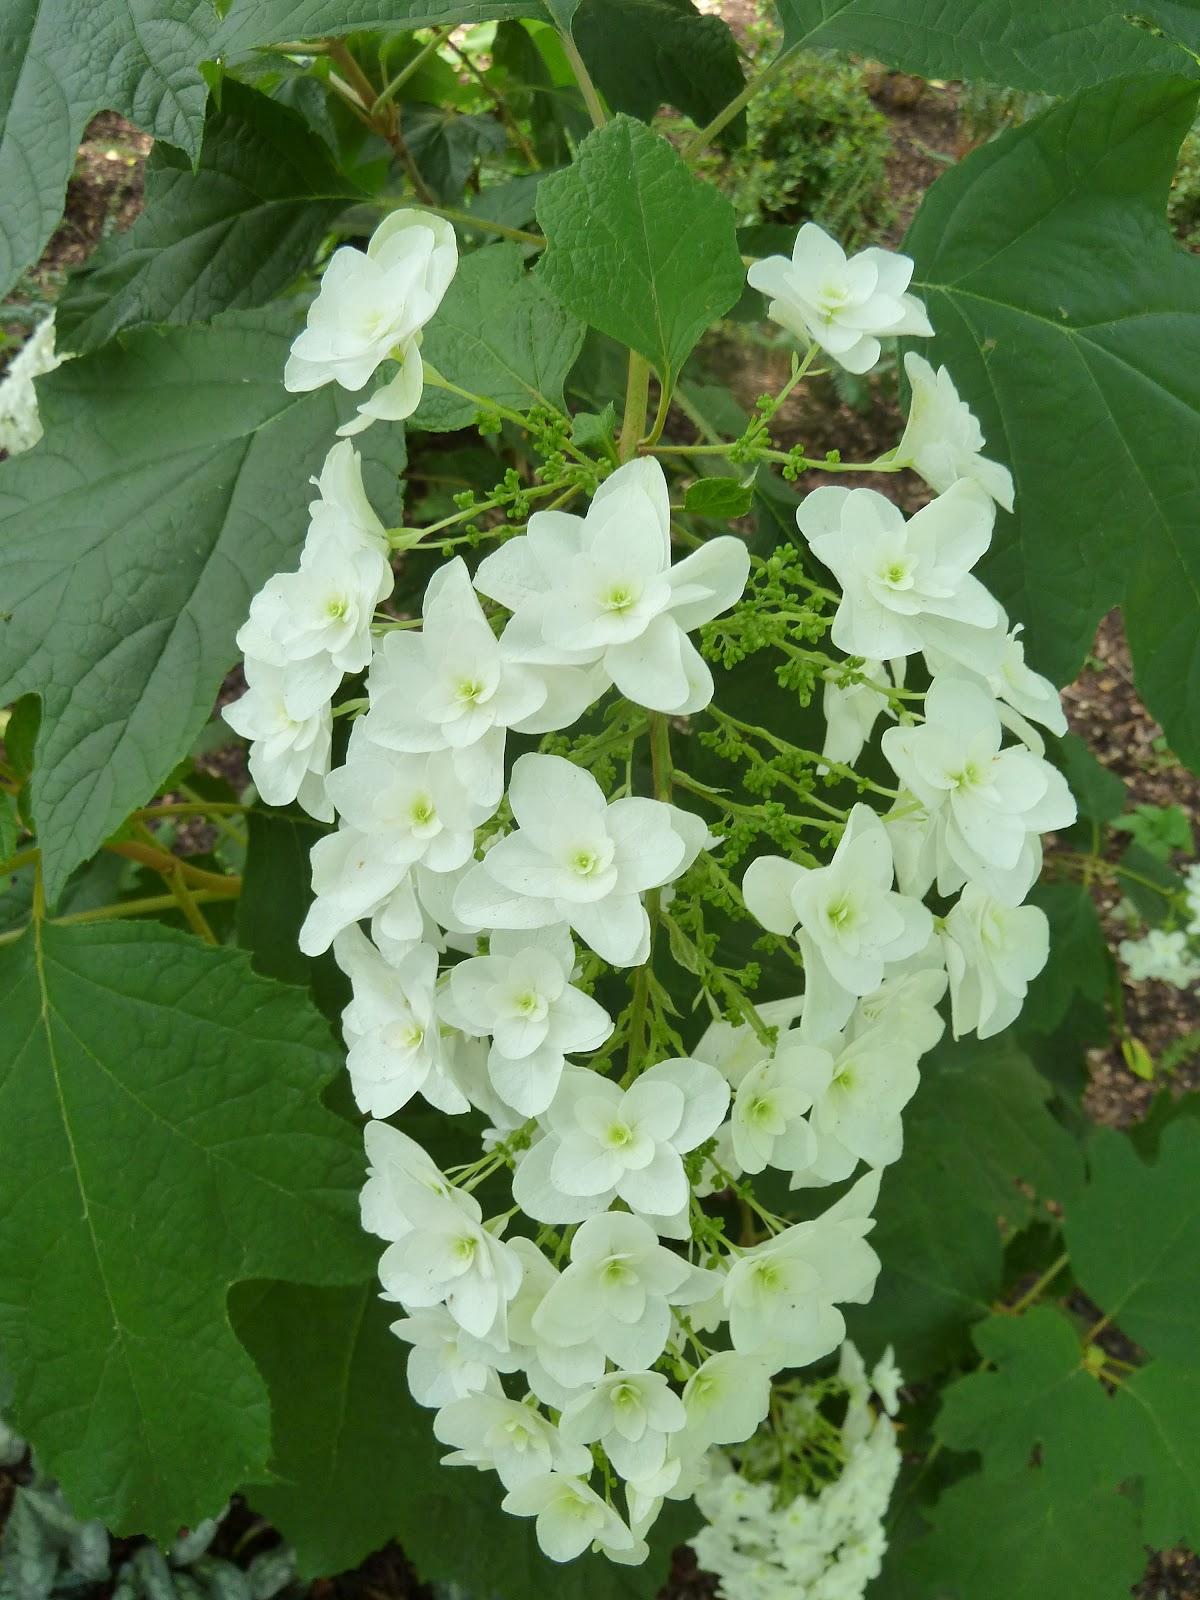 Hydrangea season mani verde green hands by josh coceano for Hydrangea quercifolia